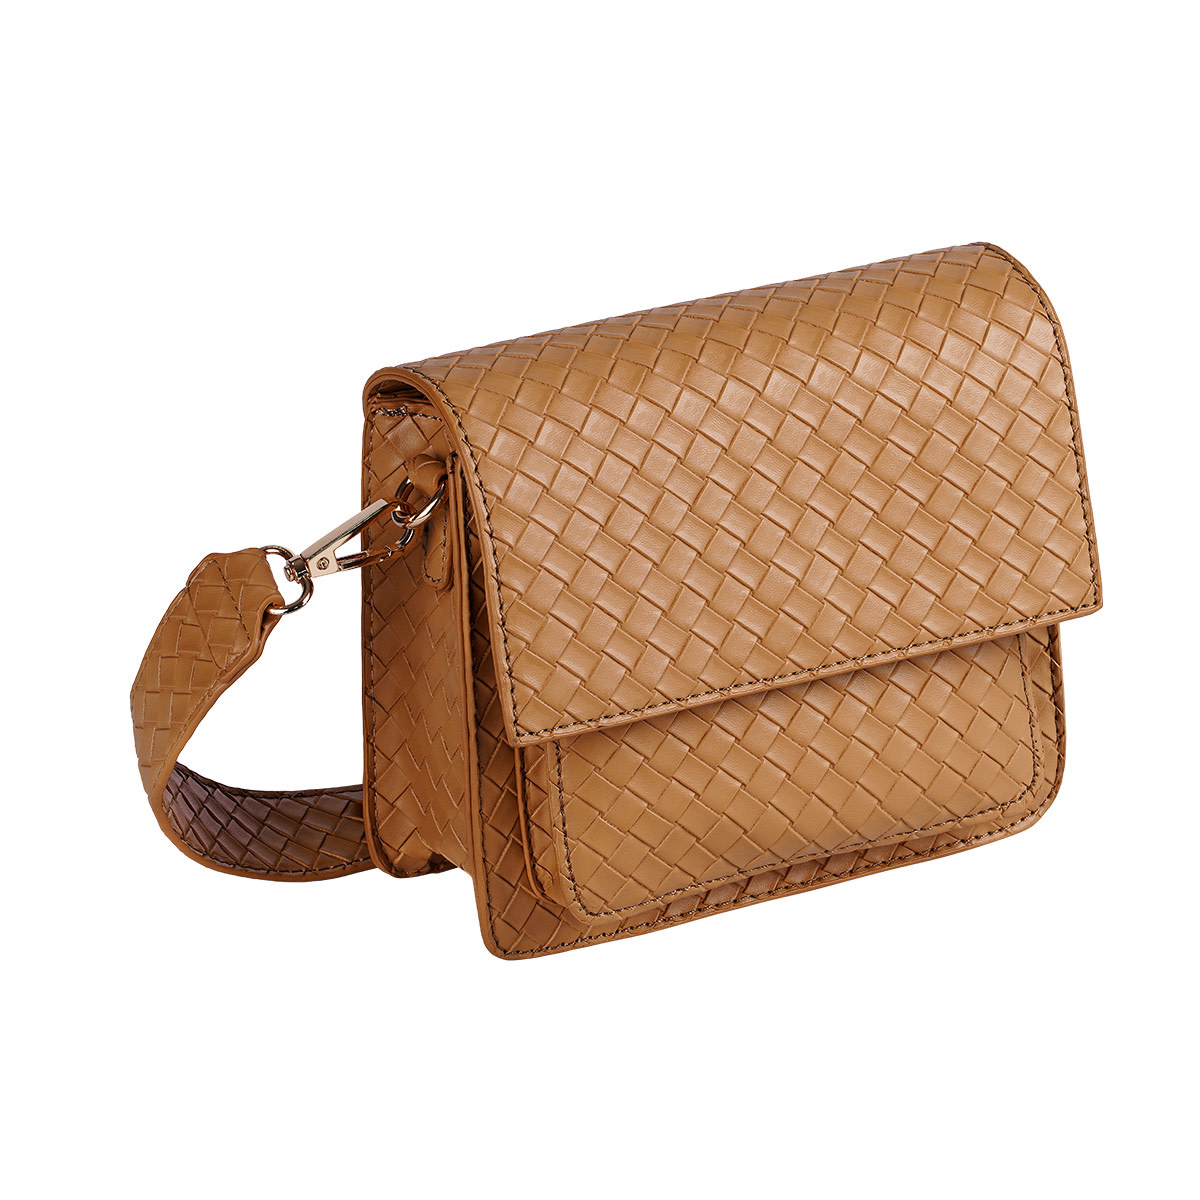 With love Bag braided  Camel 18cm x 15cm